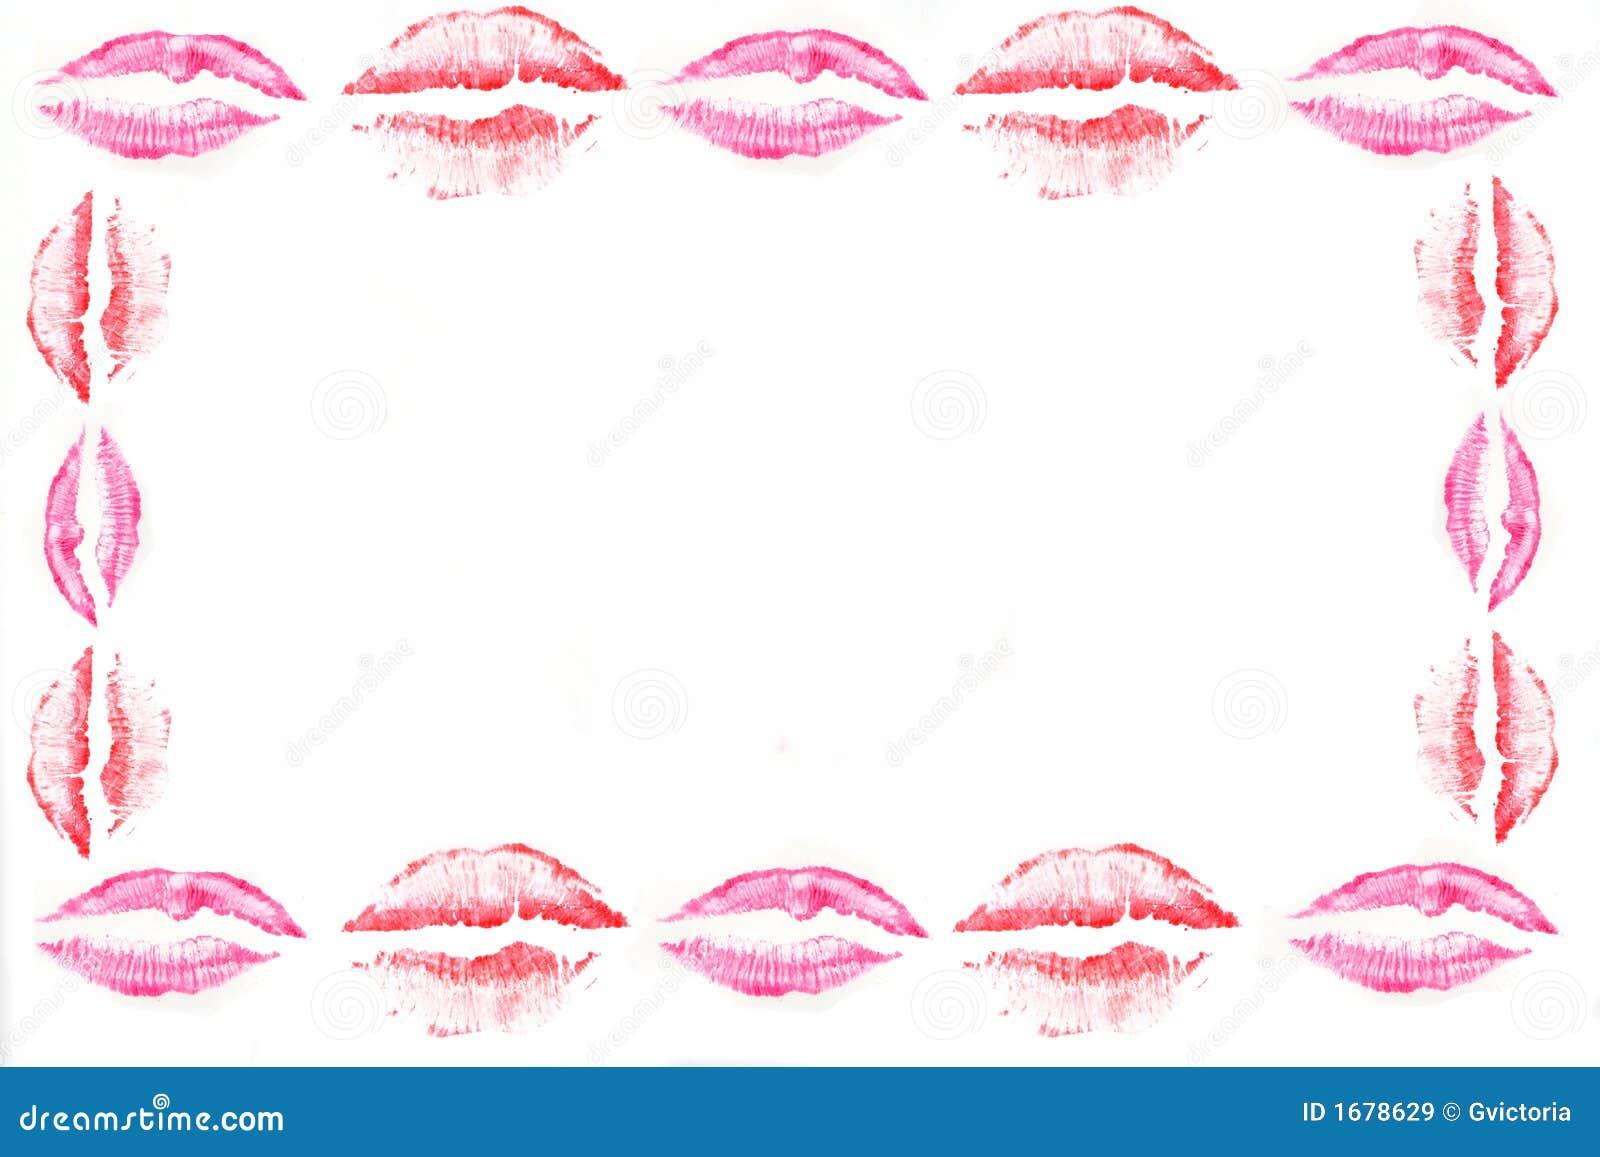 Kiss Border Royalty Free Stock Images - Image: 1678629